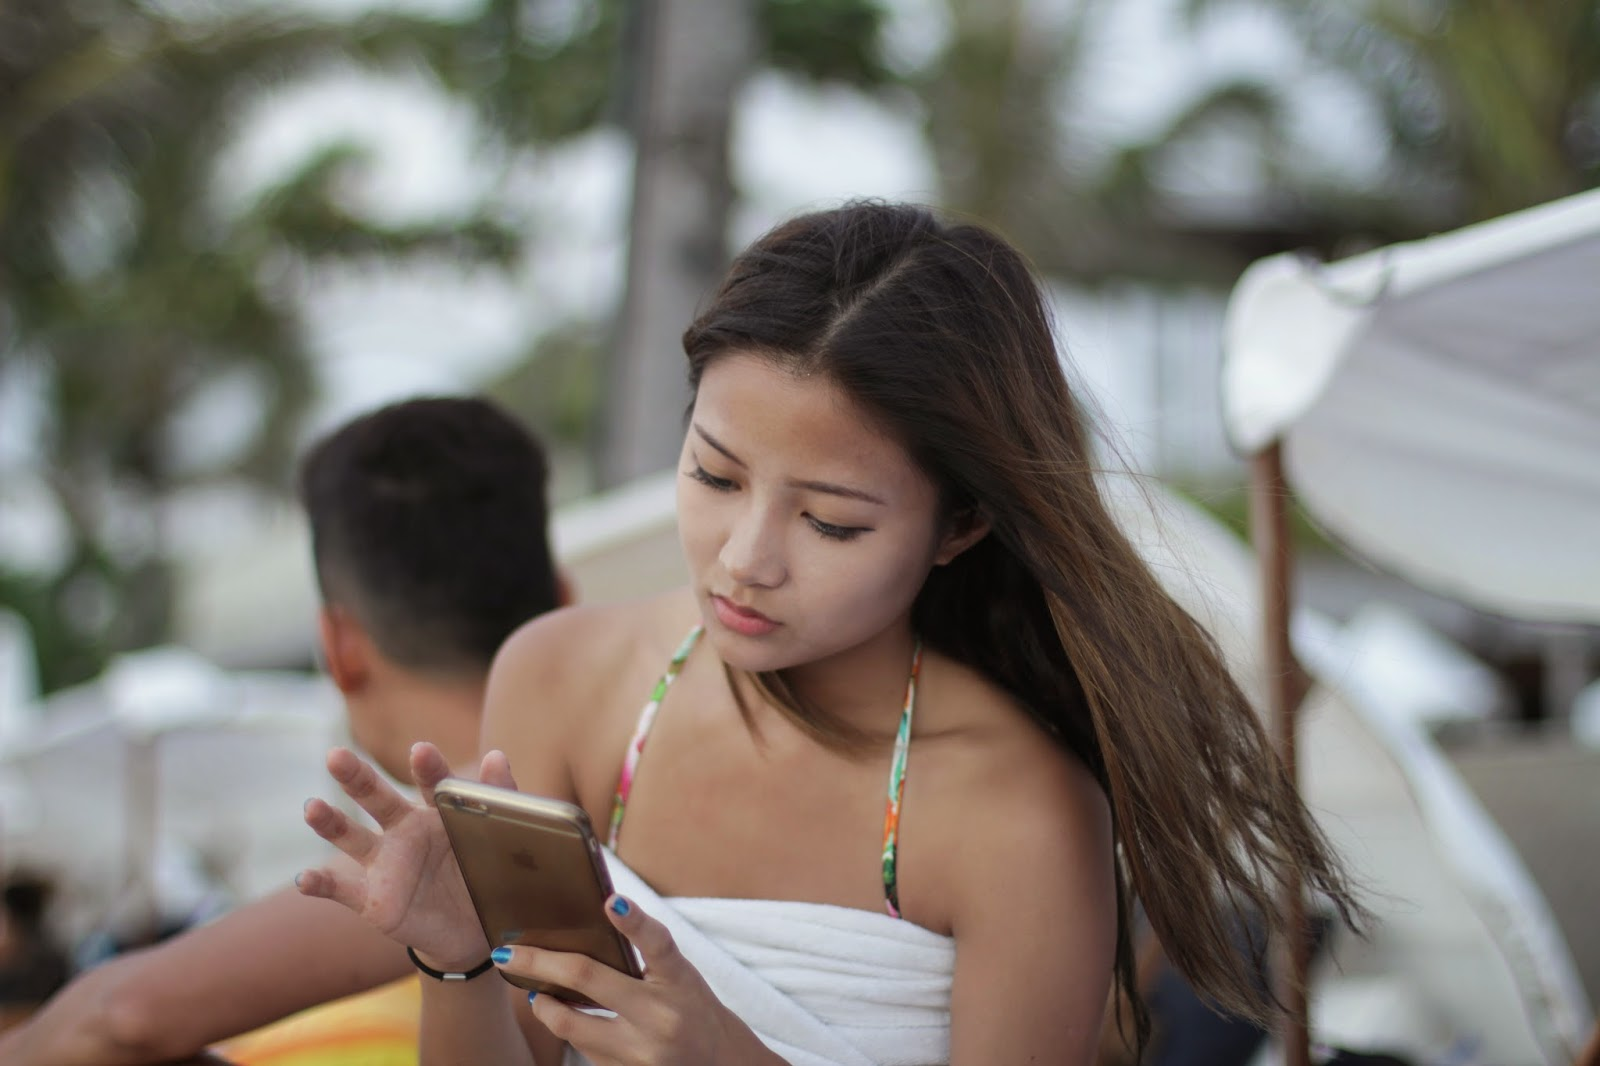 EUNICE ANNABEL: Oh Bali Bali!